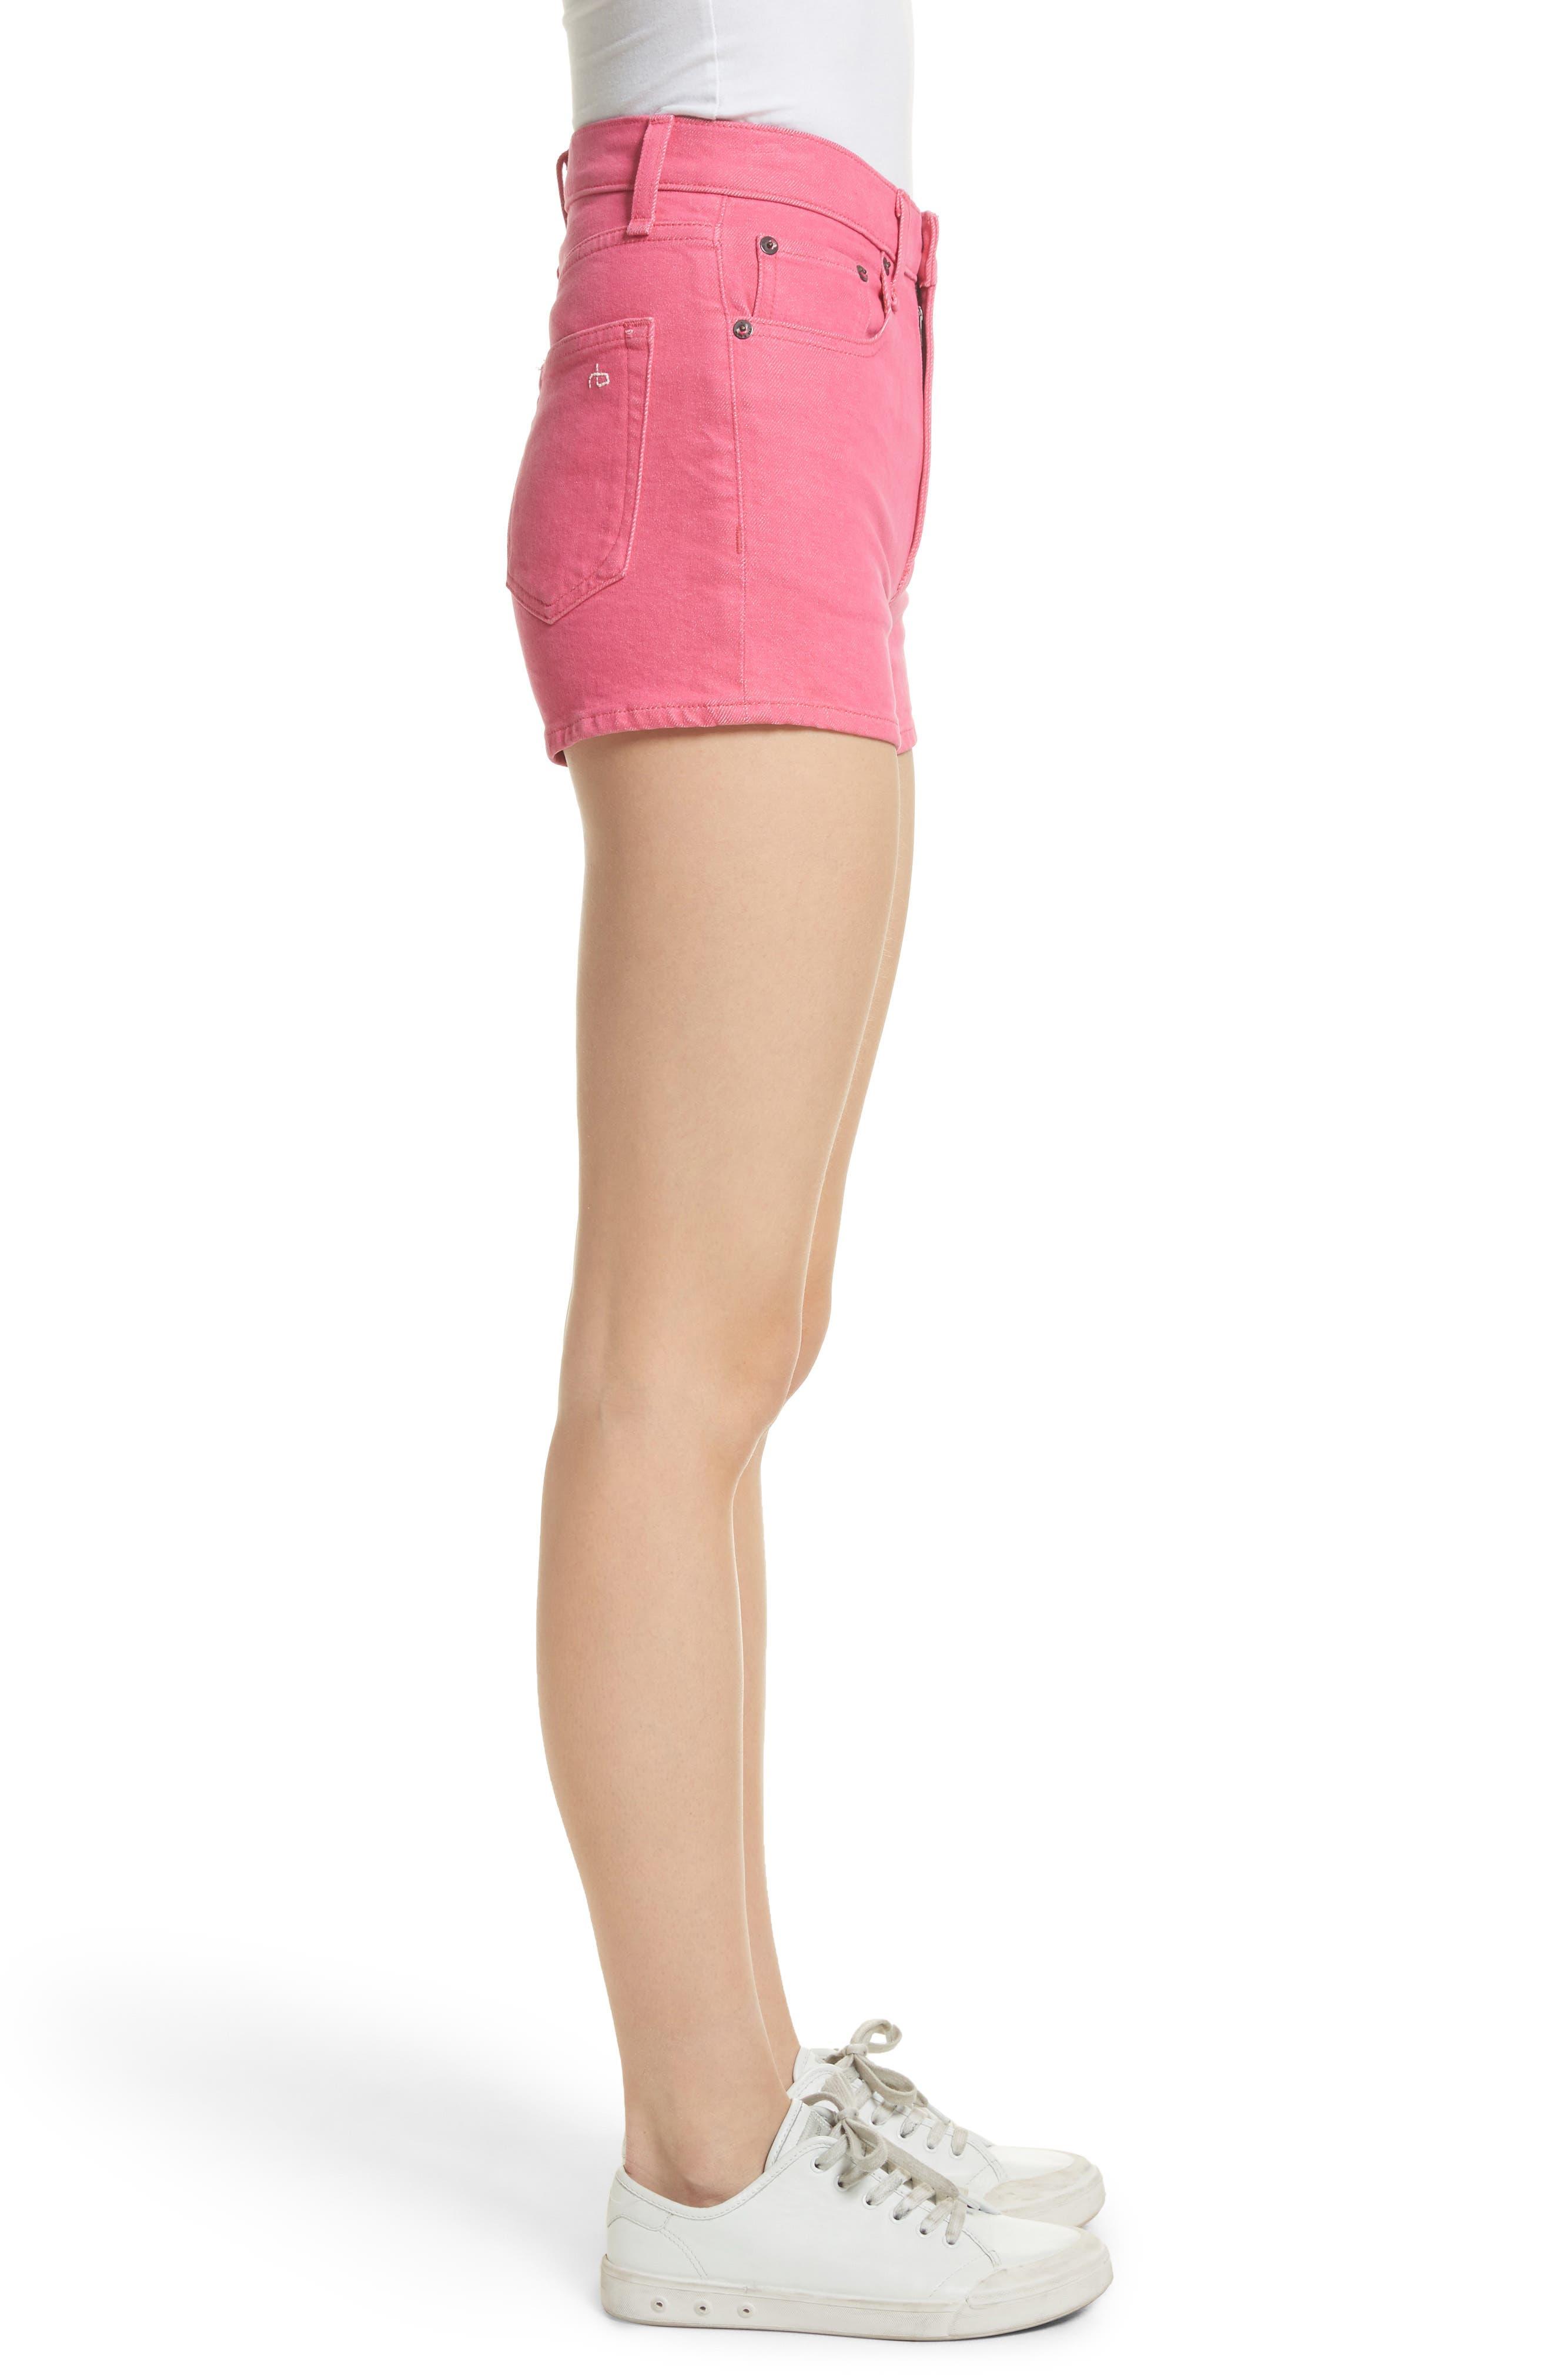 Justine High Waist Denim Shorts,                             Alternate thumbnail 3, color,                             Bull Pink